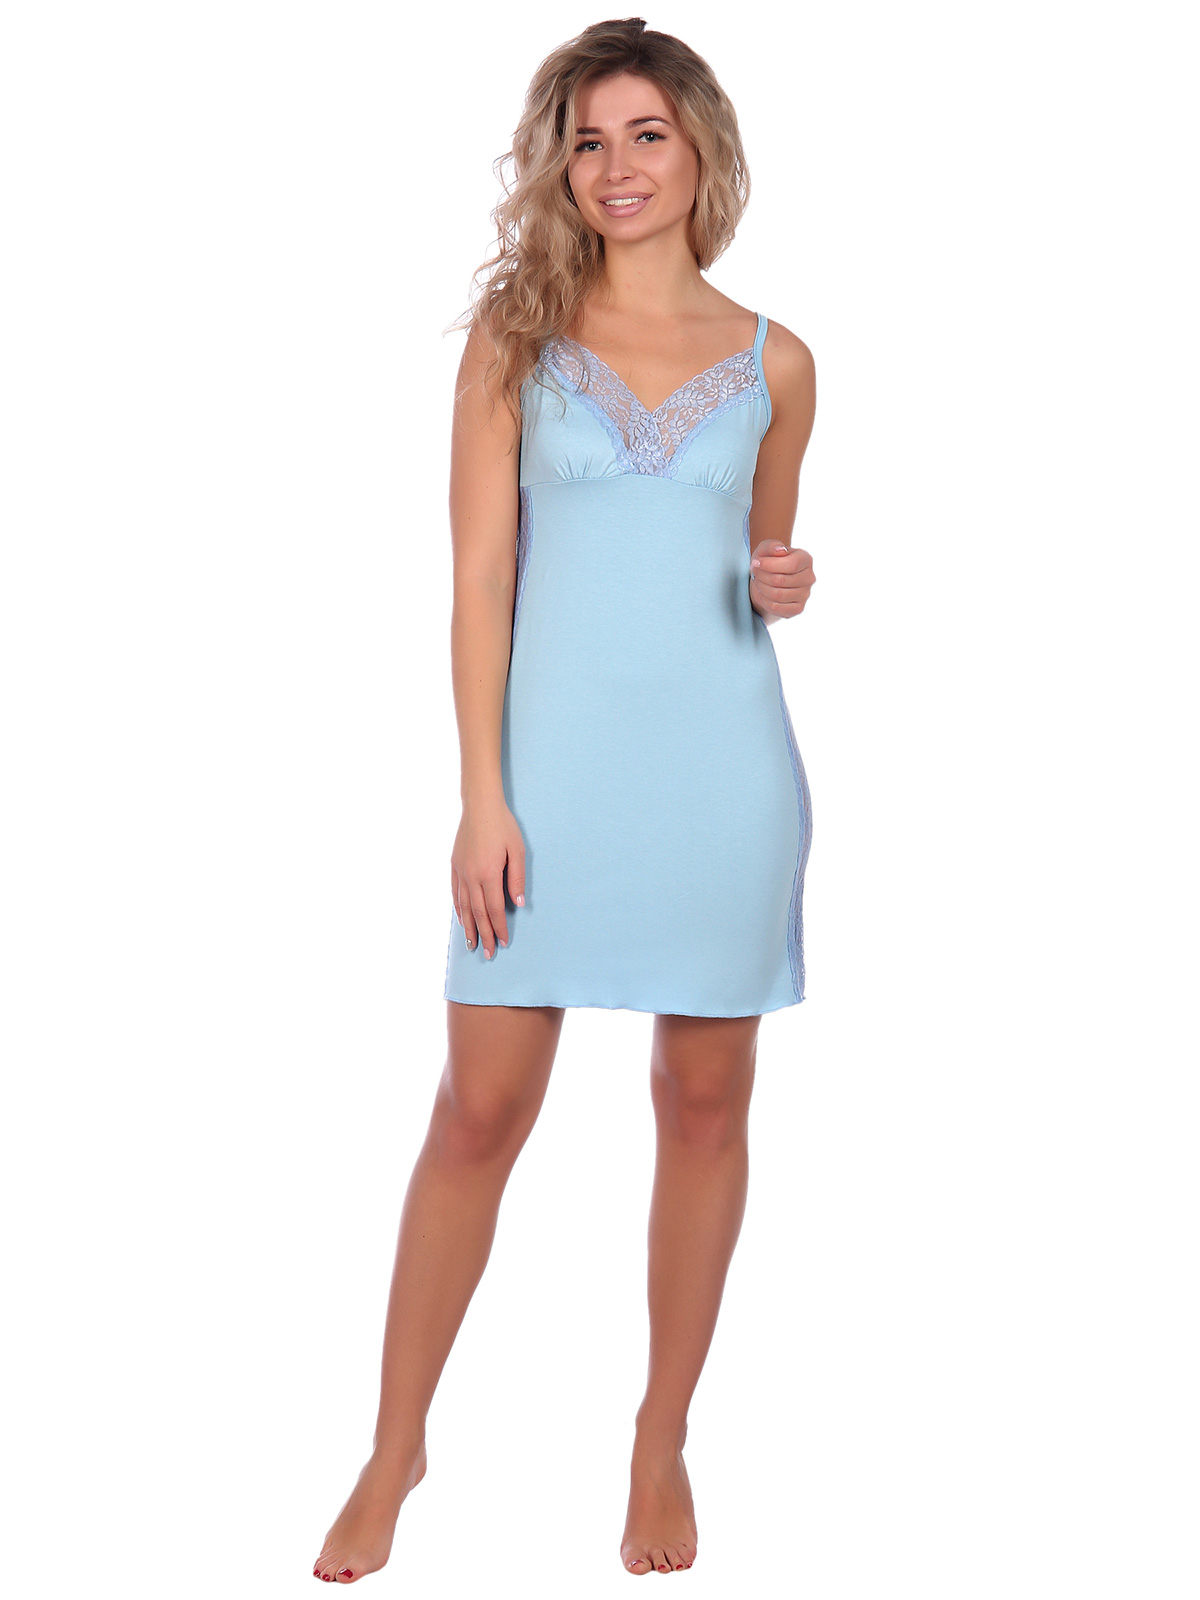 Жен. сорочка арт. 16-0622 Голубой р. 50 НСД Трикотаж